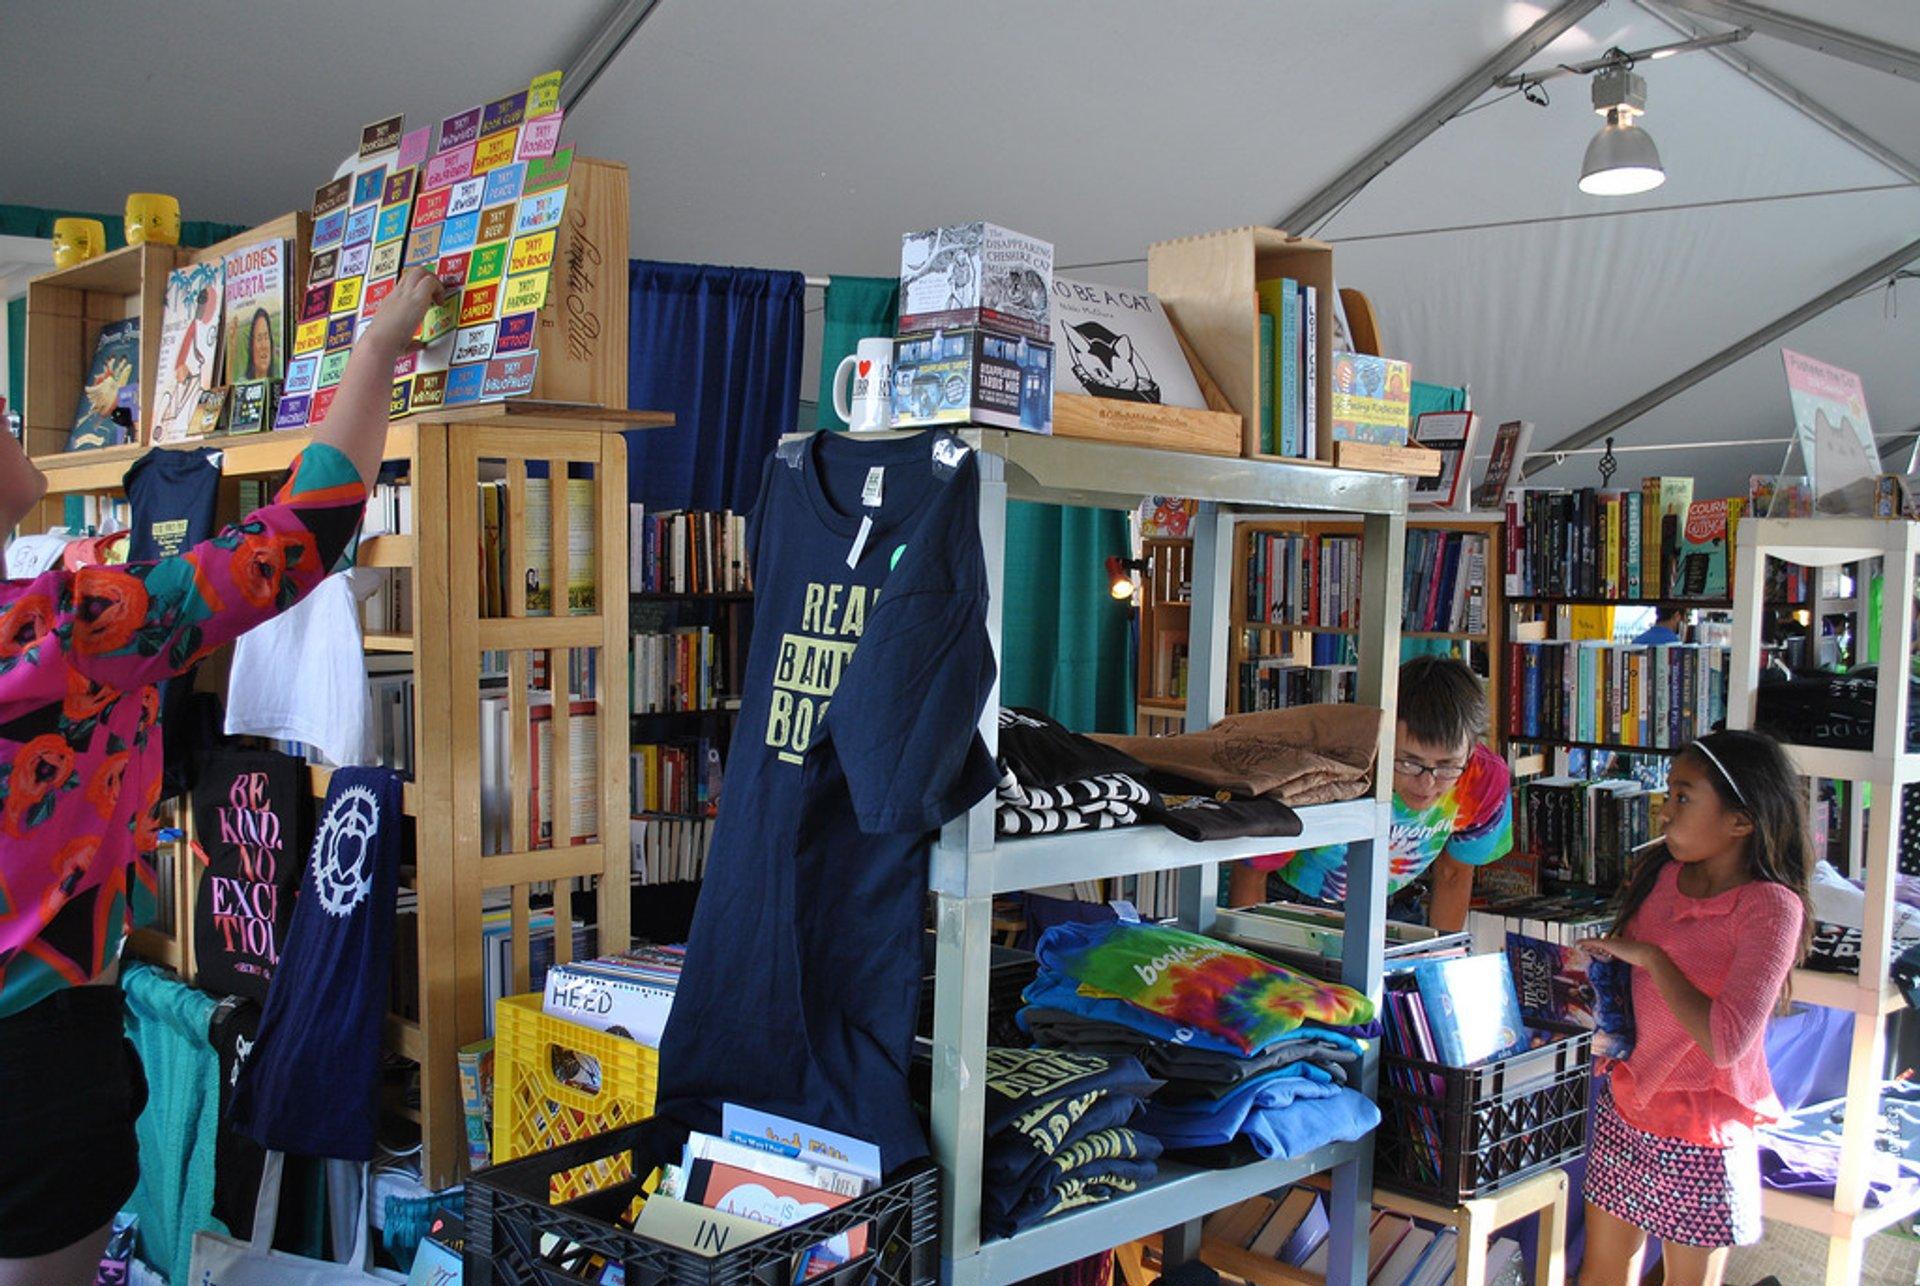 Texas Book Festival in Texas - Best Season 2020